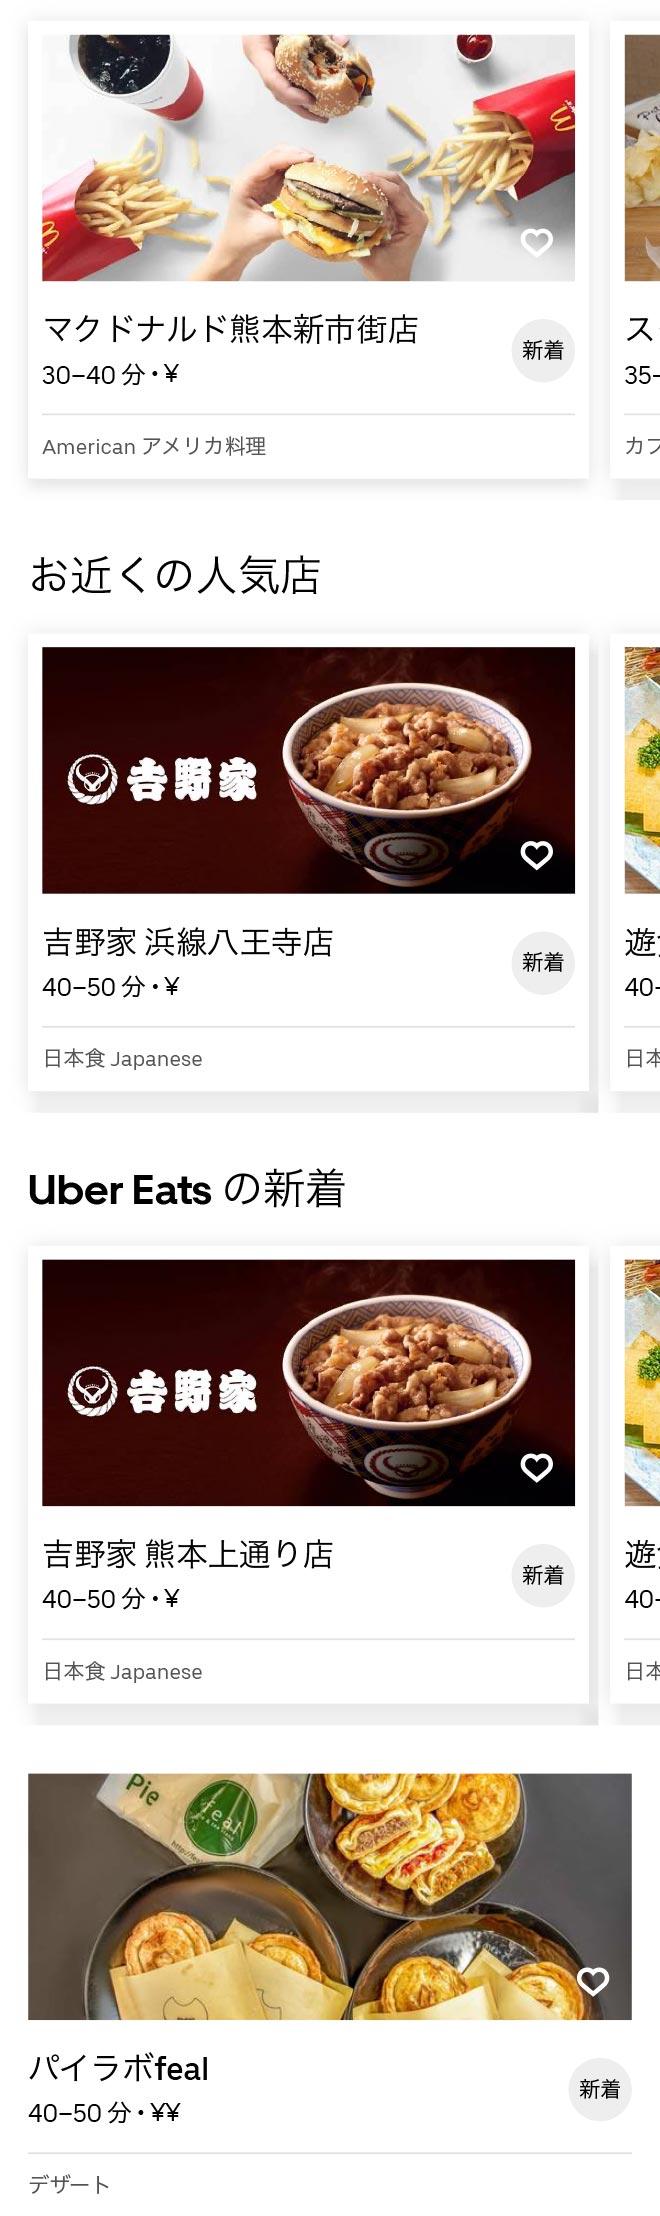 Kumamoto menu 2008 01